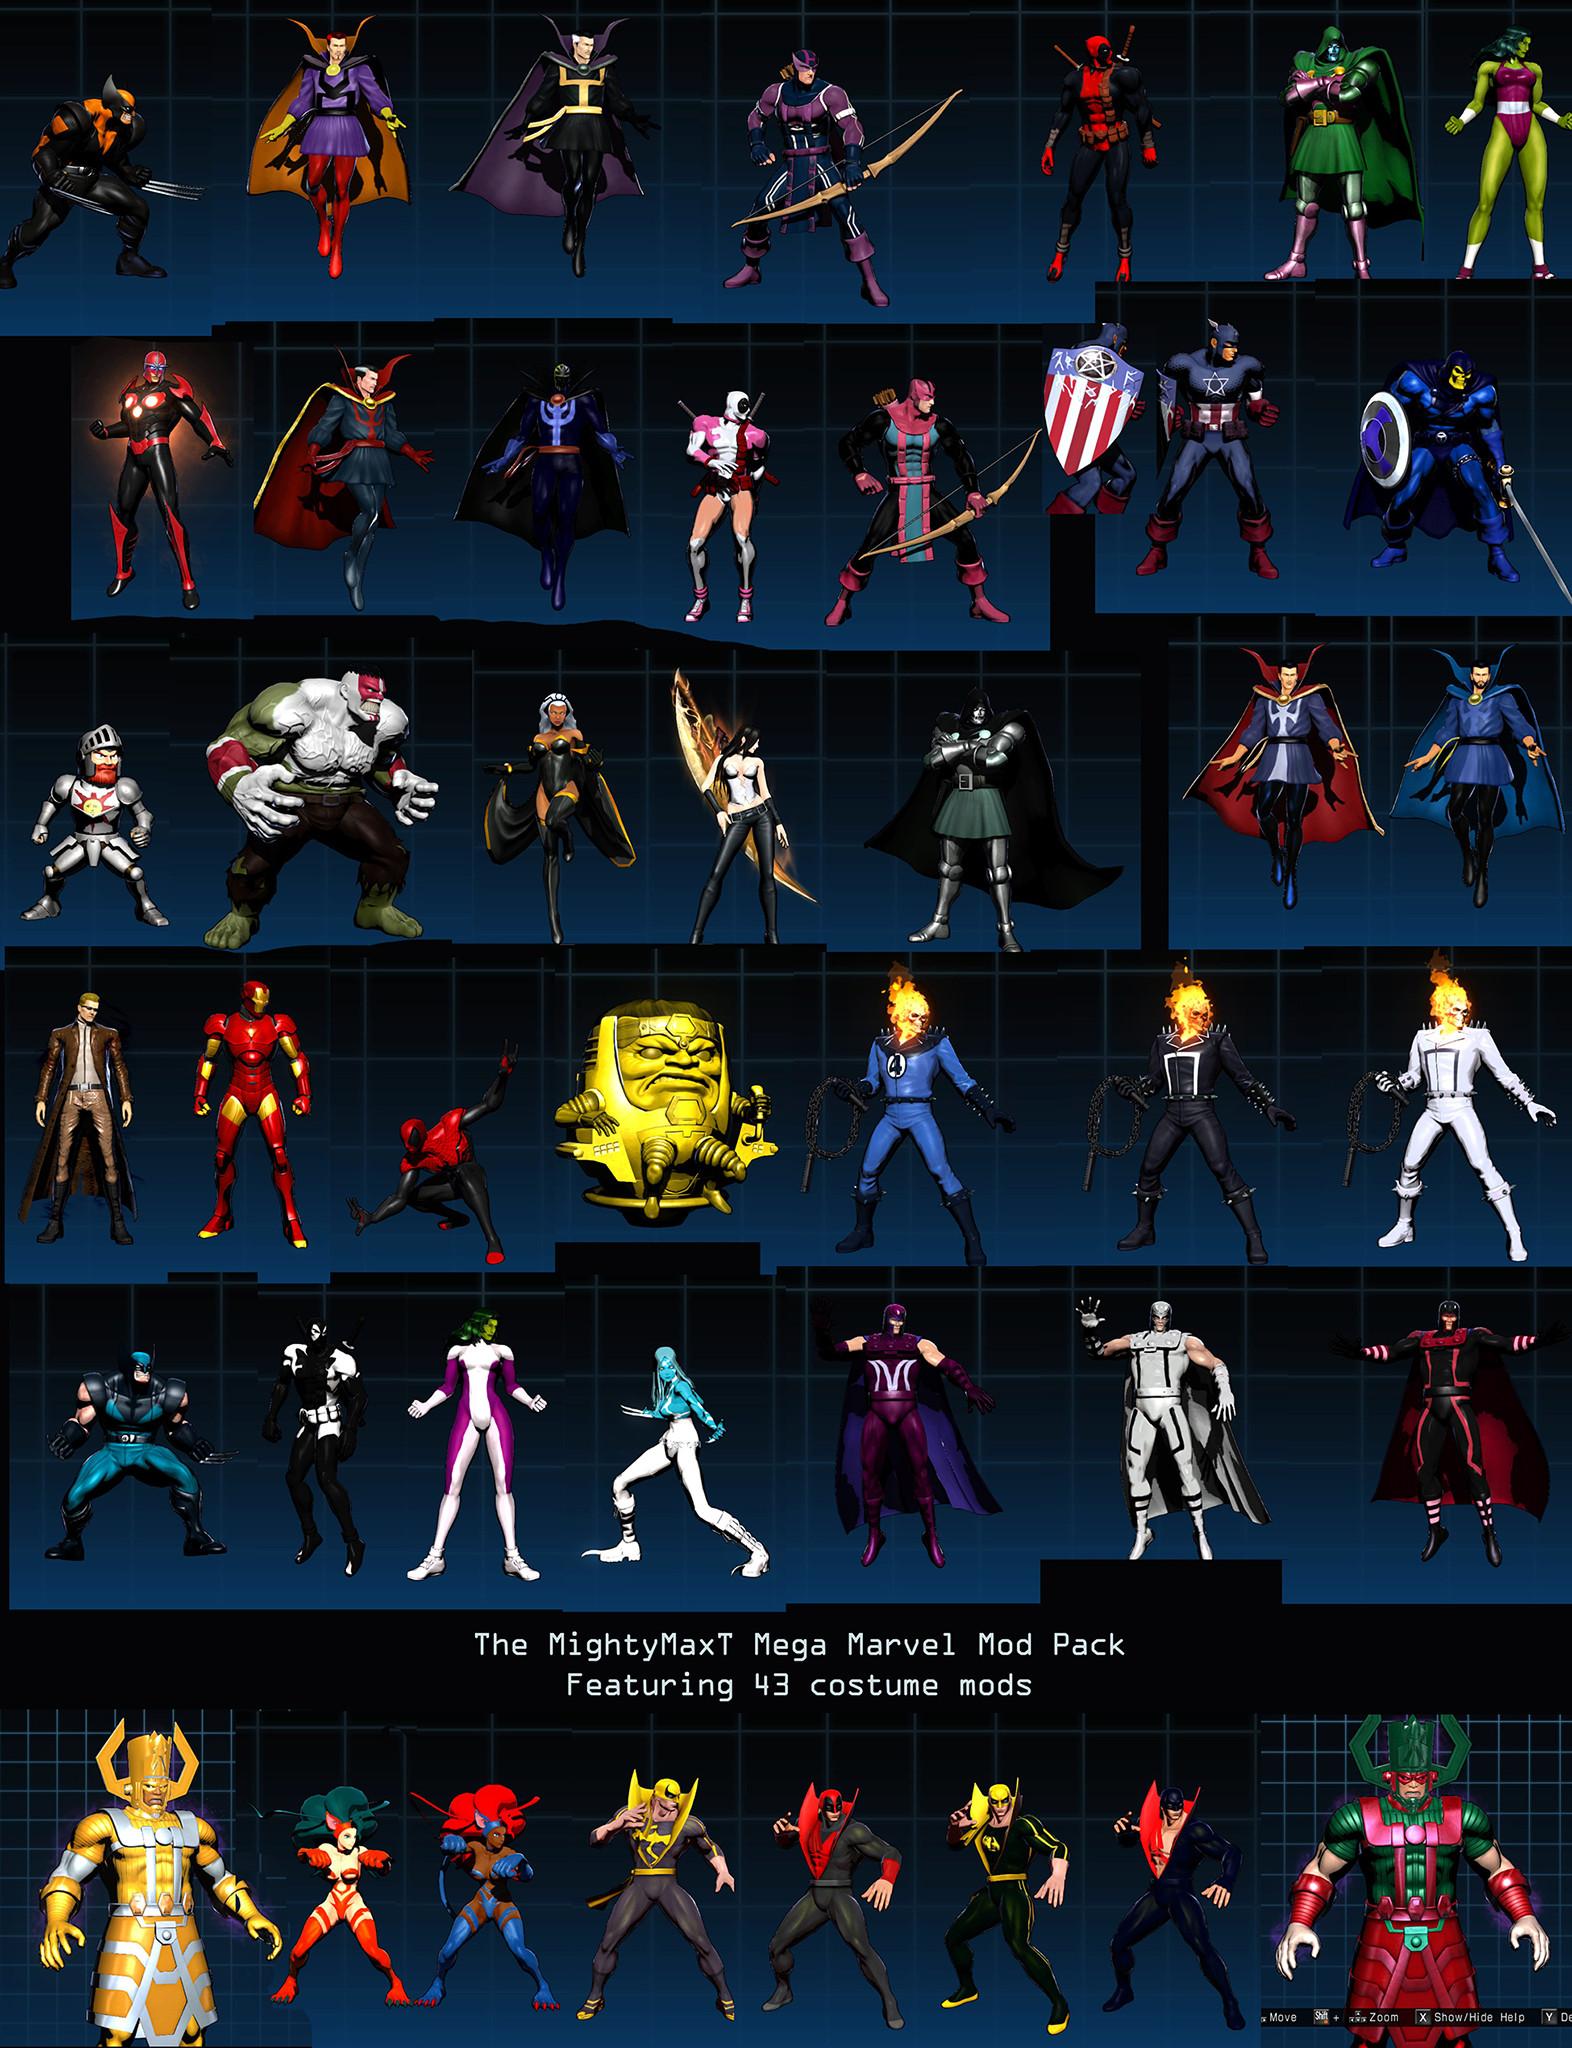 The 43 Mod Pack Ultimate Marvel Vs Capcom 3 Mods